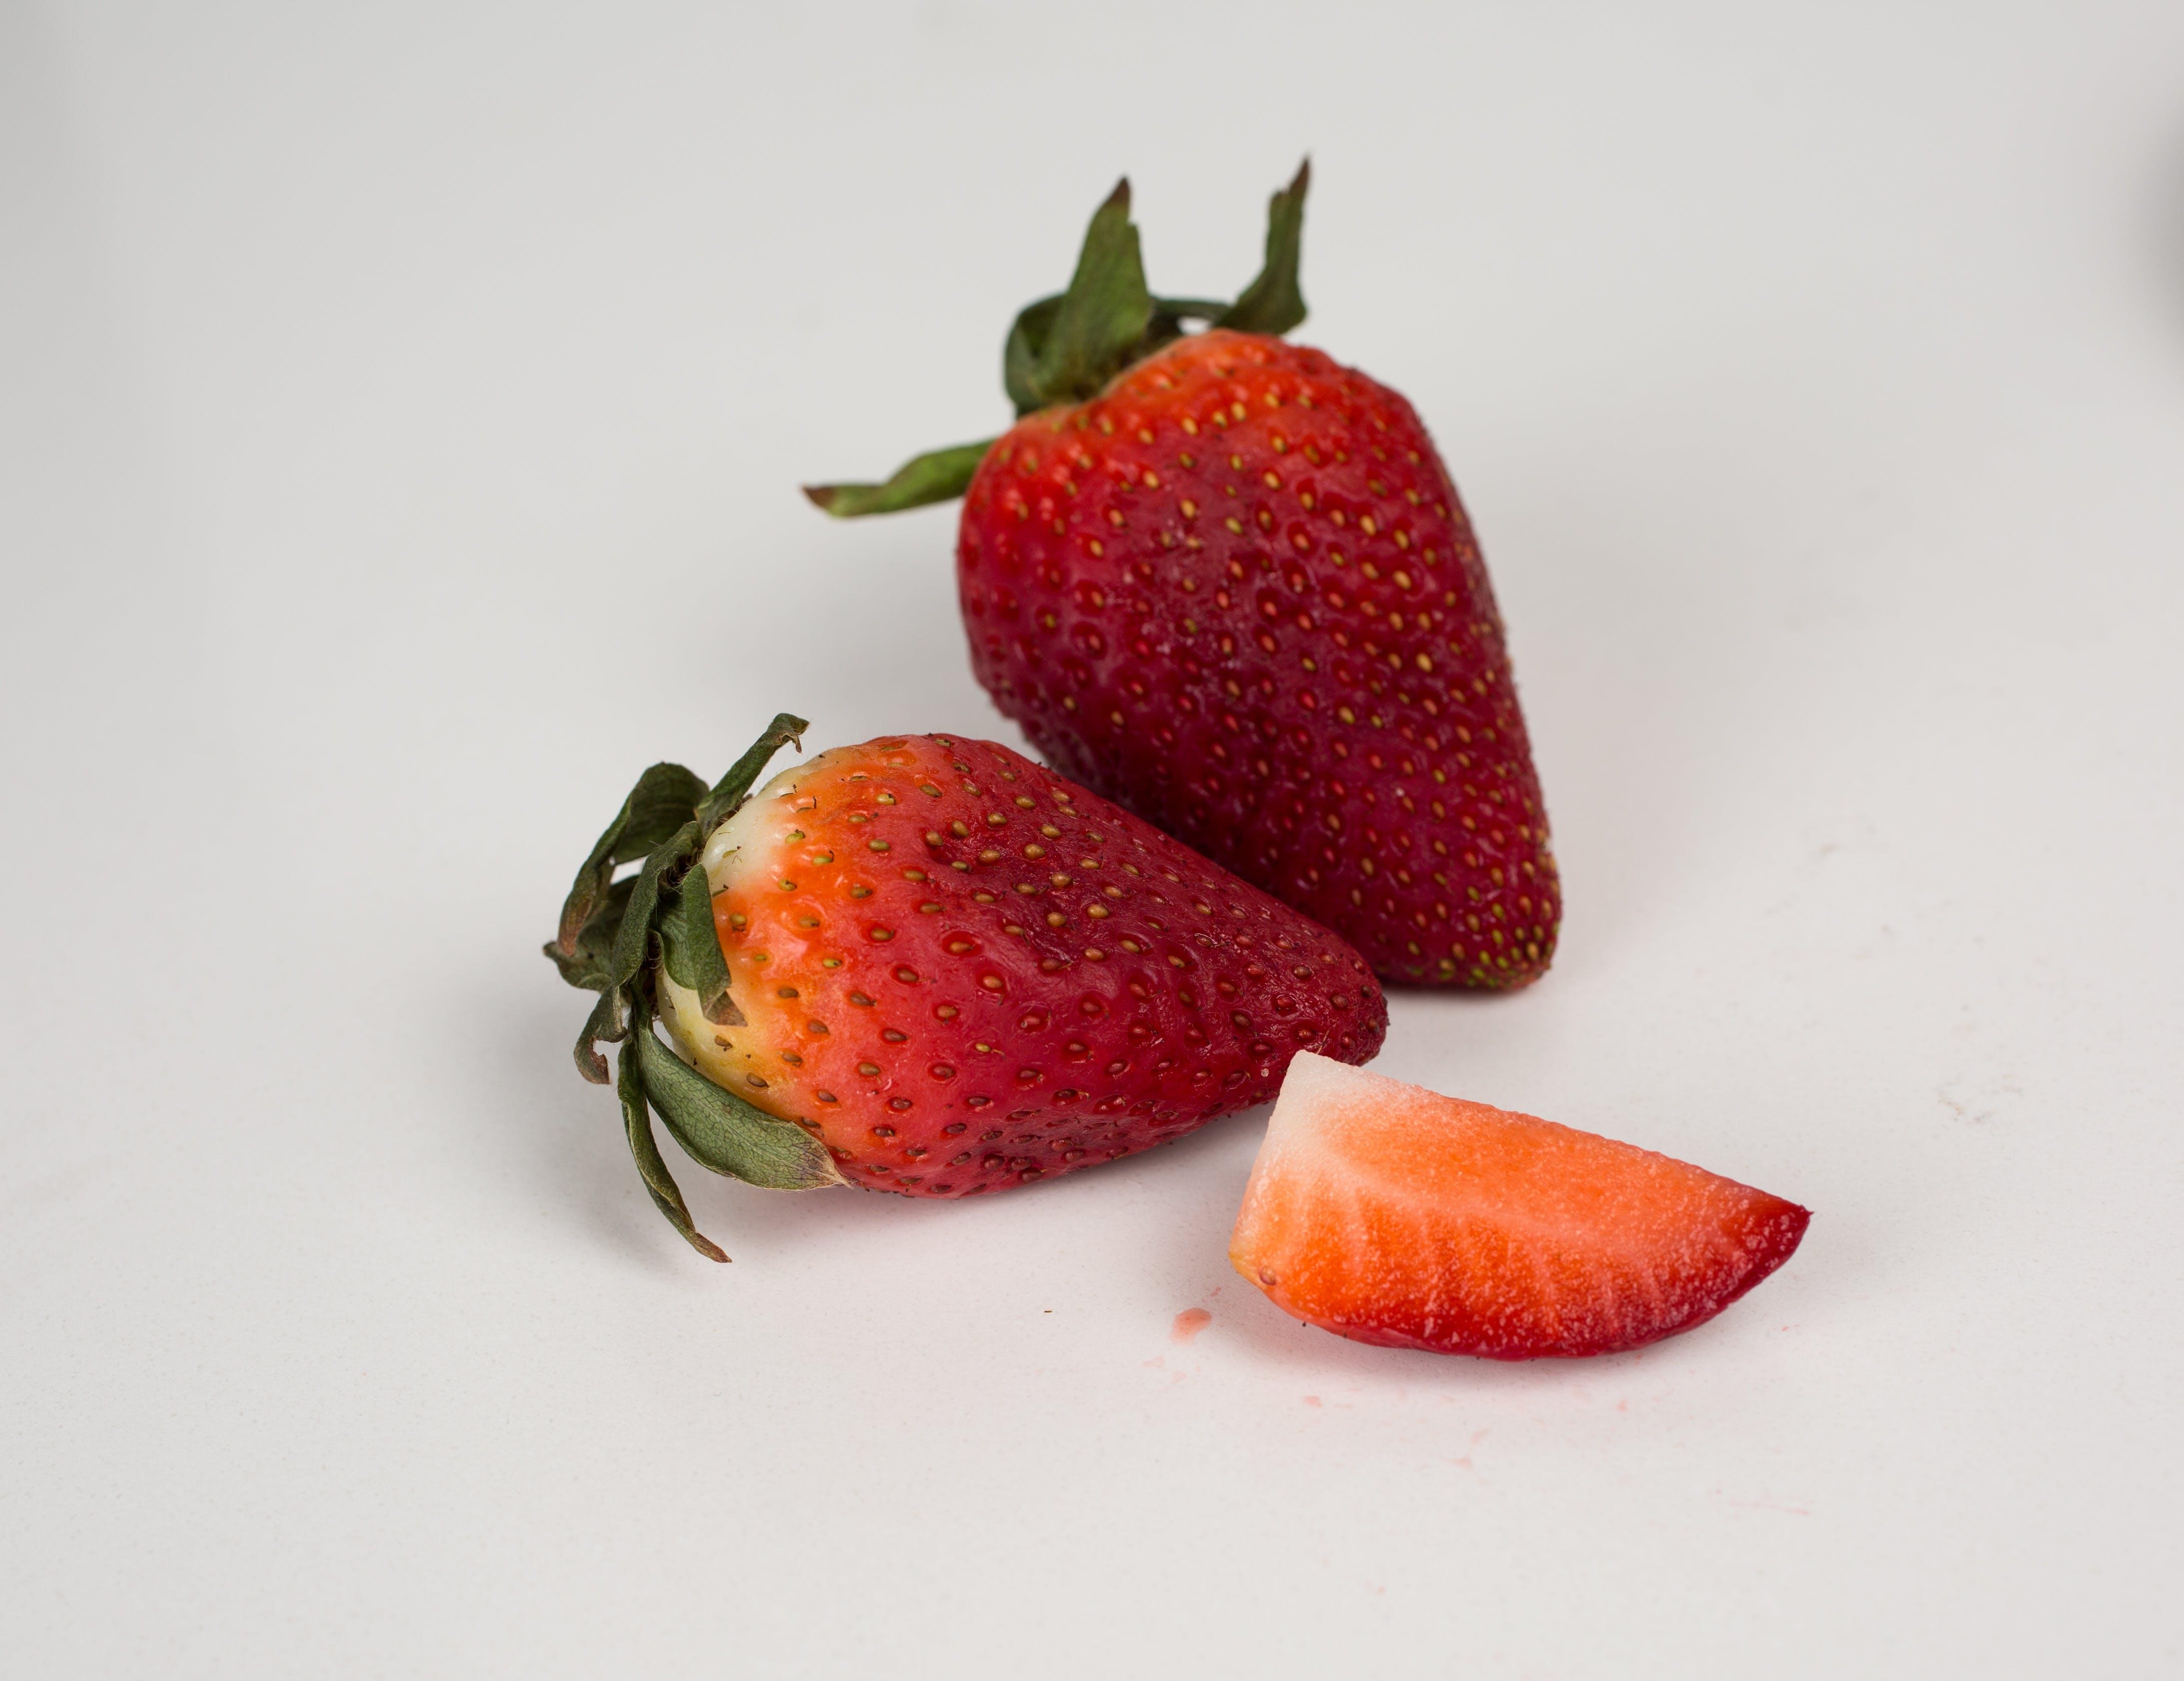 Free stock photo of strawberries